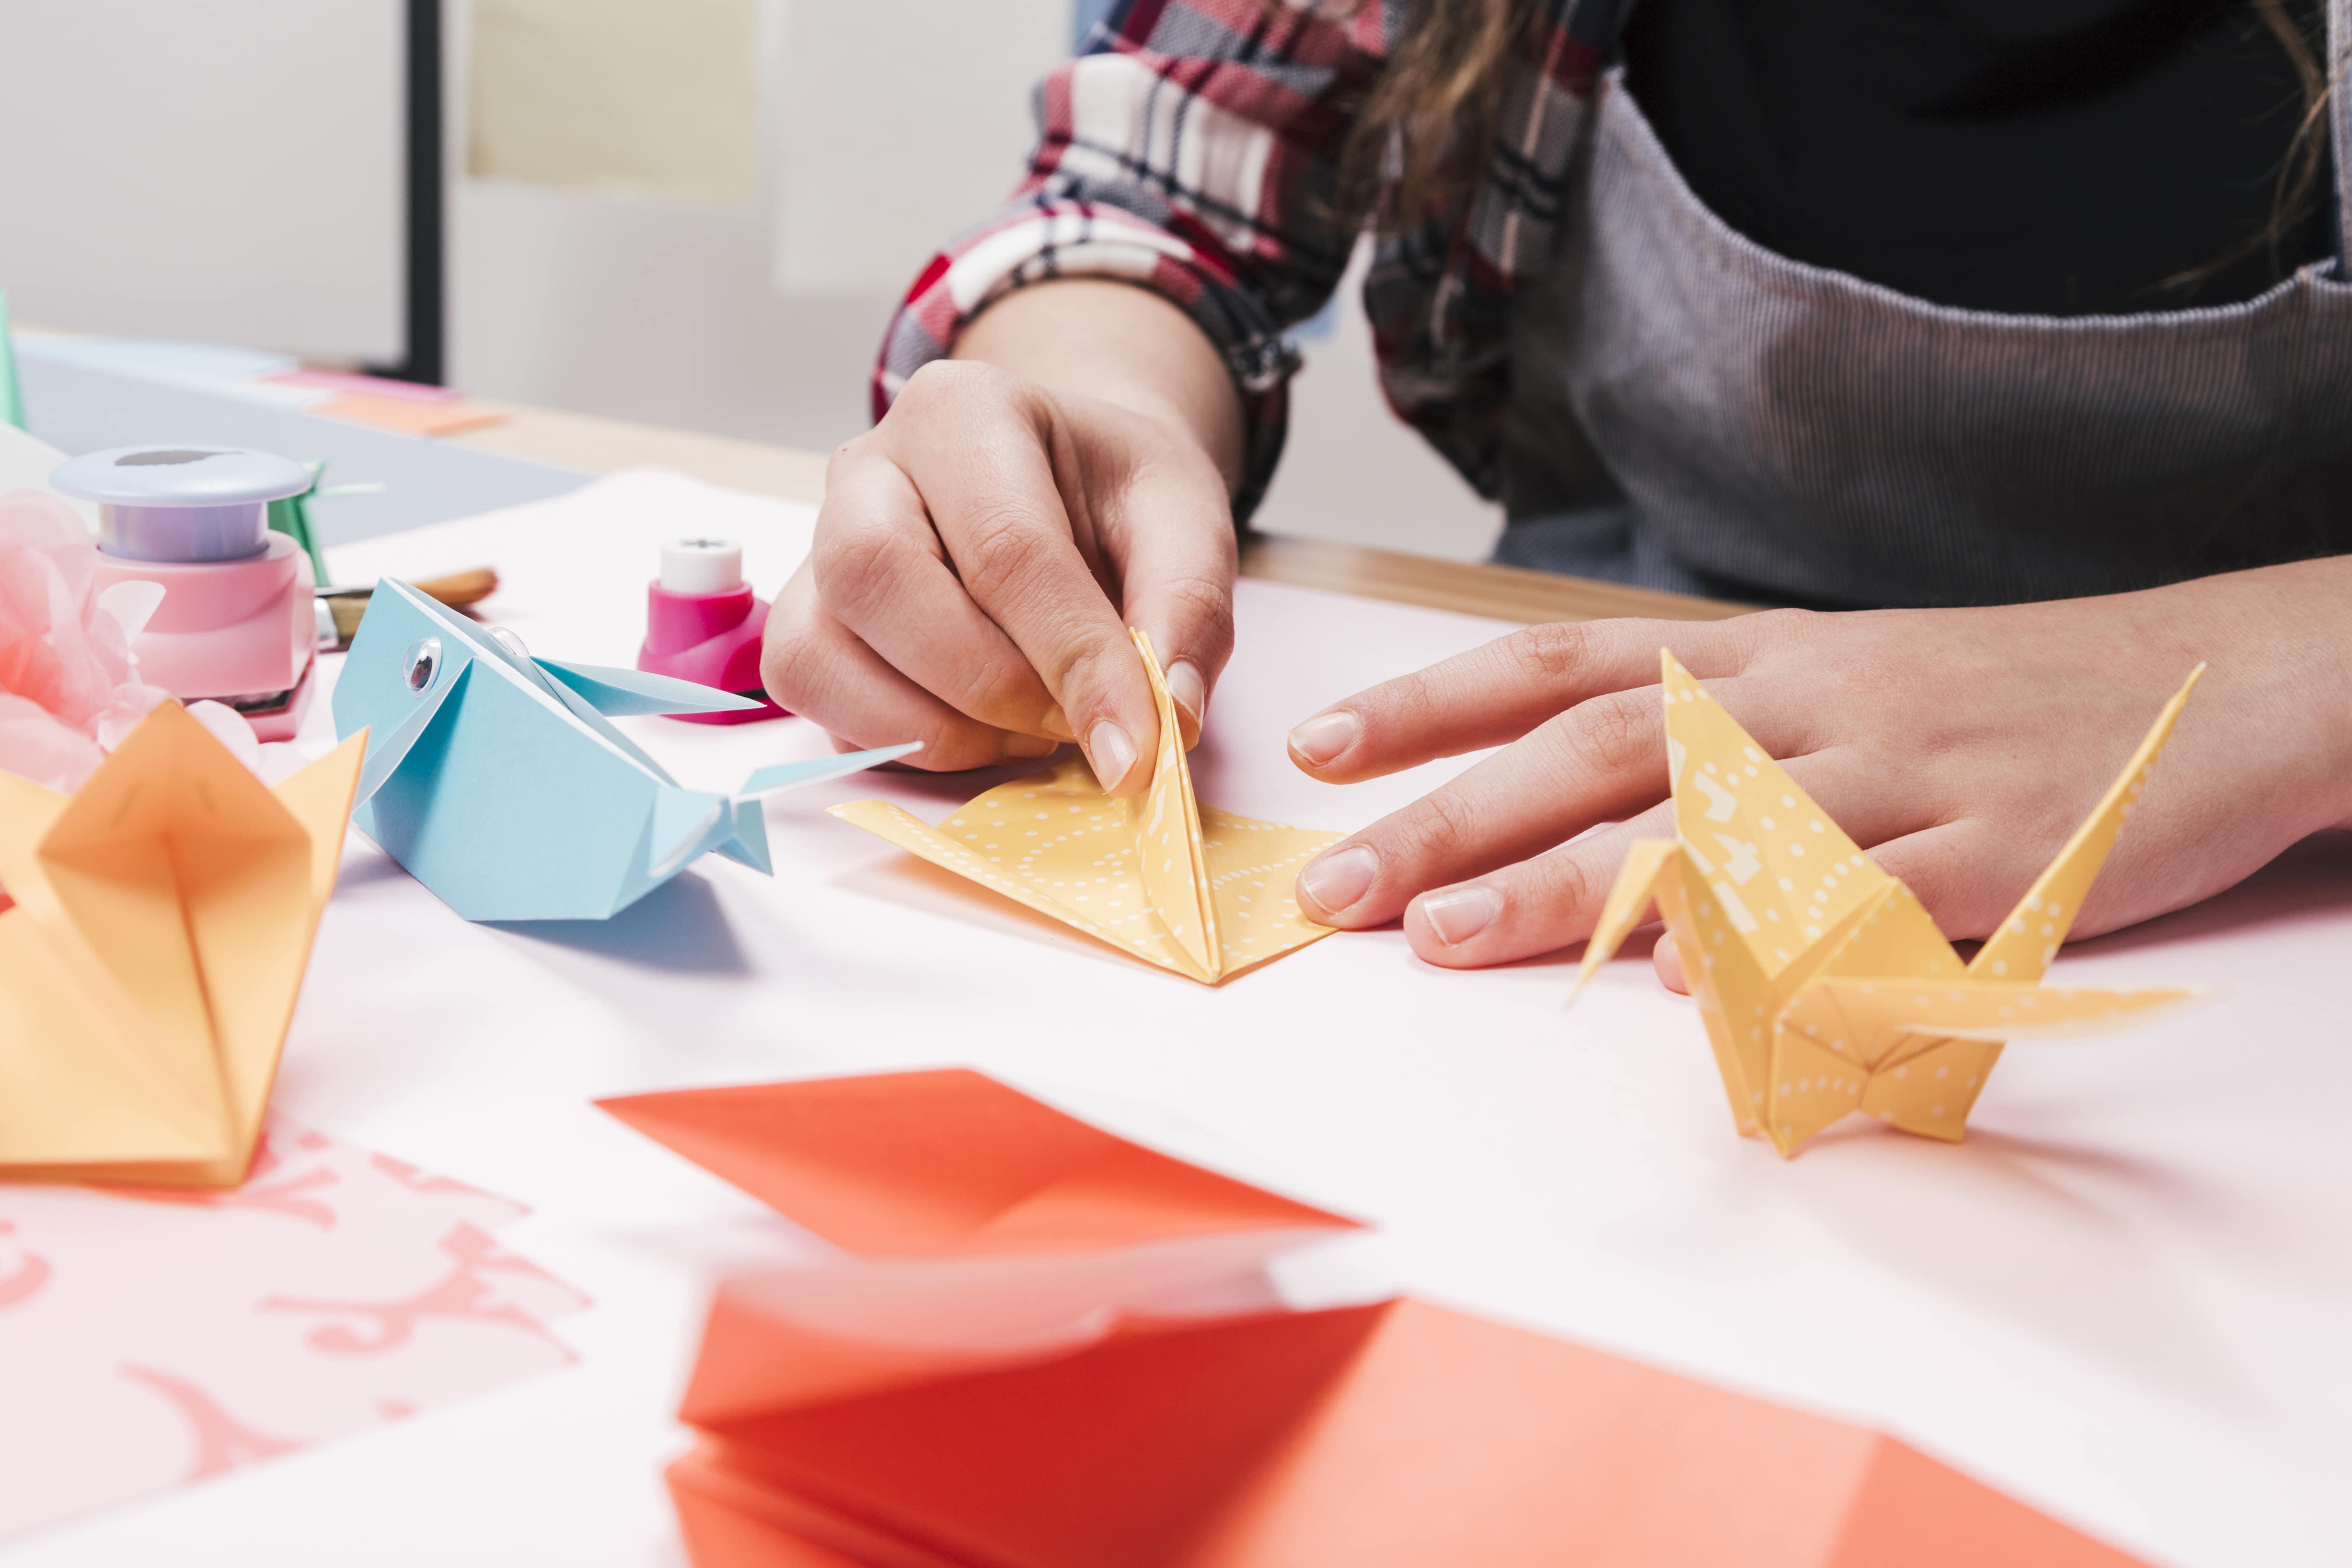 manos haciendo papiroflexia para niños